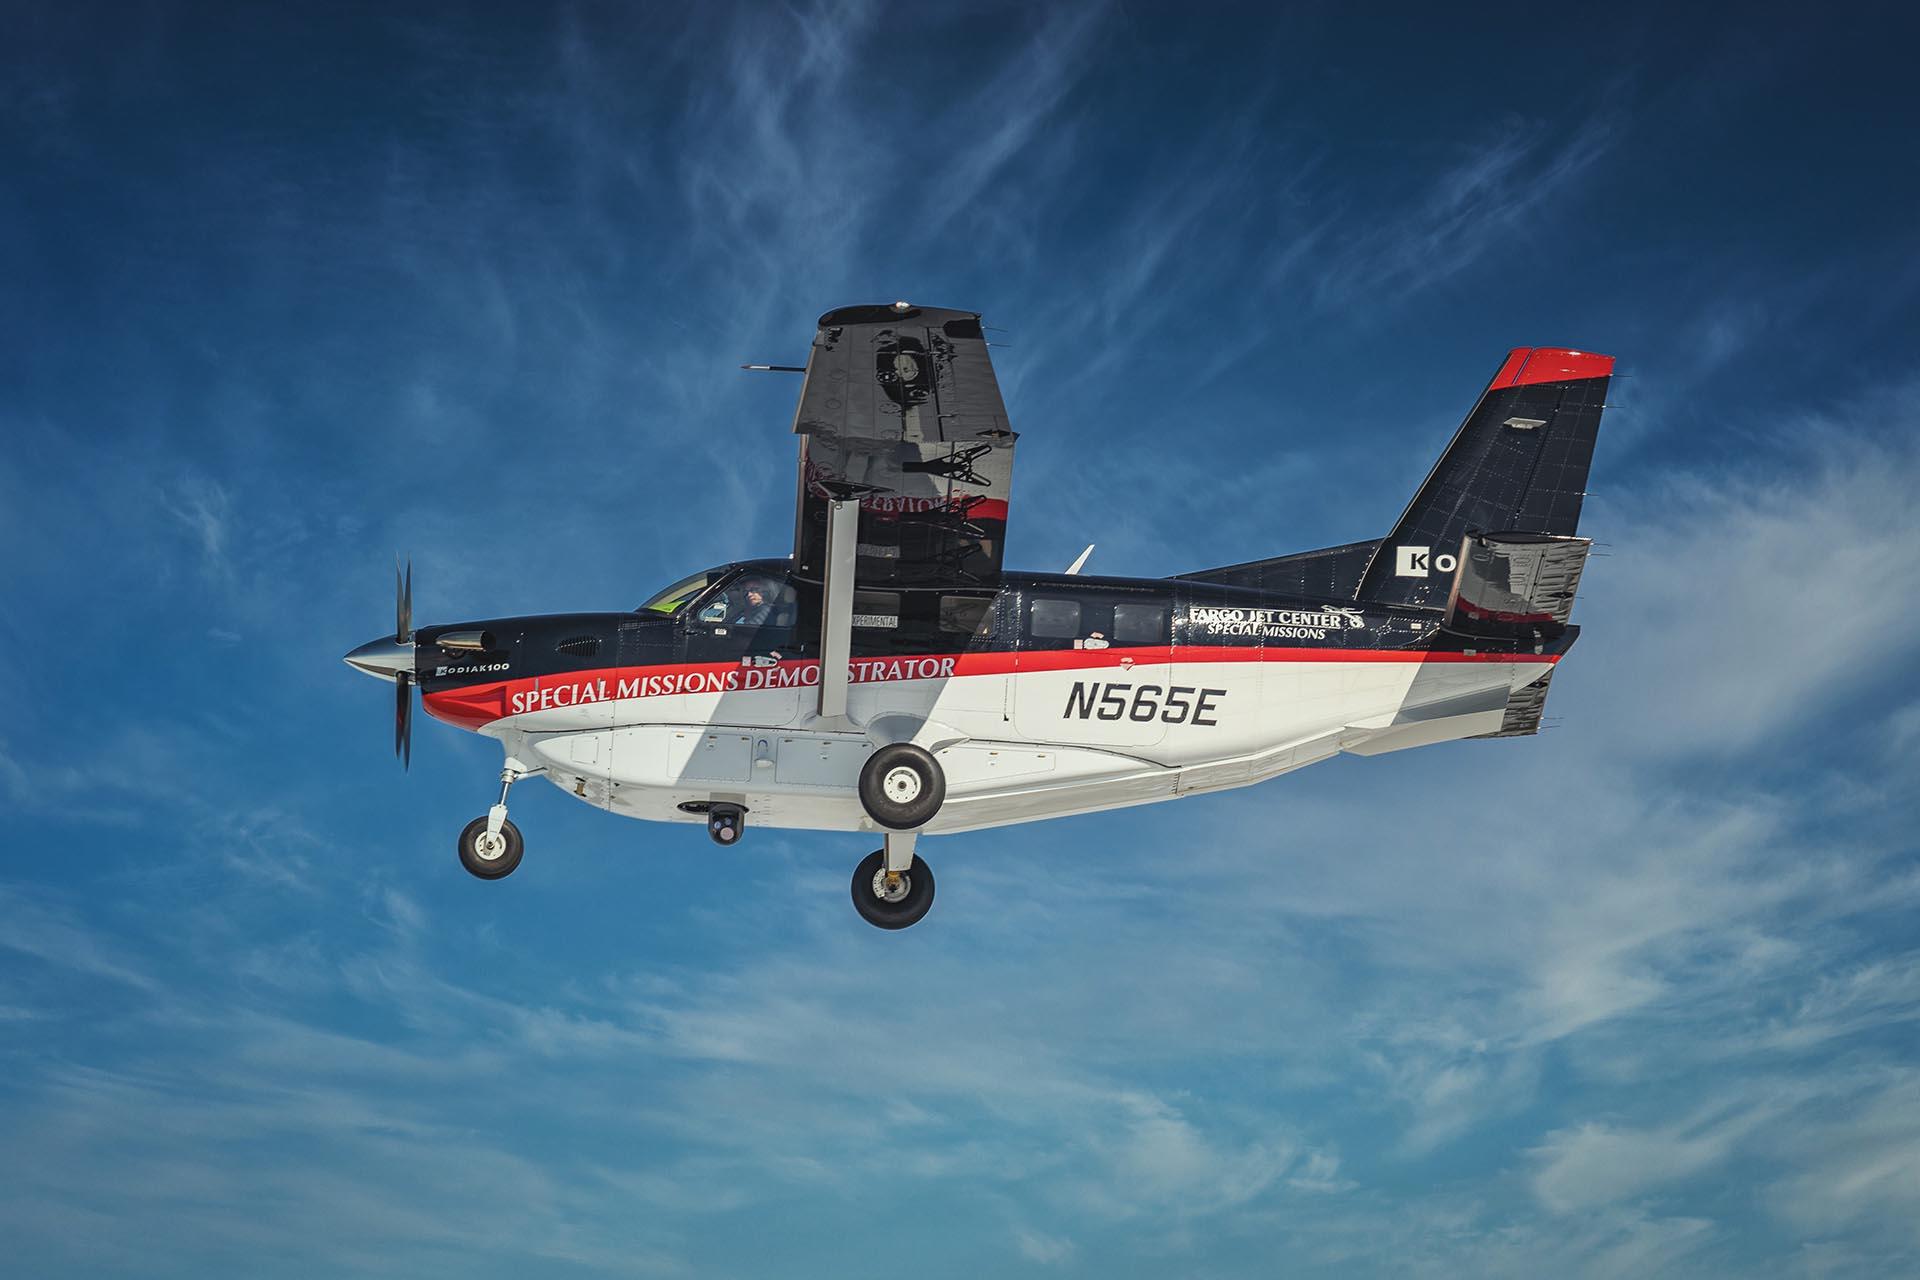 Kodiak Retractable Camera Mount Fargo Jet Center Special MIssions Aircraft